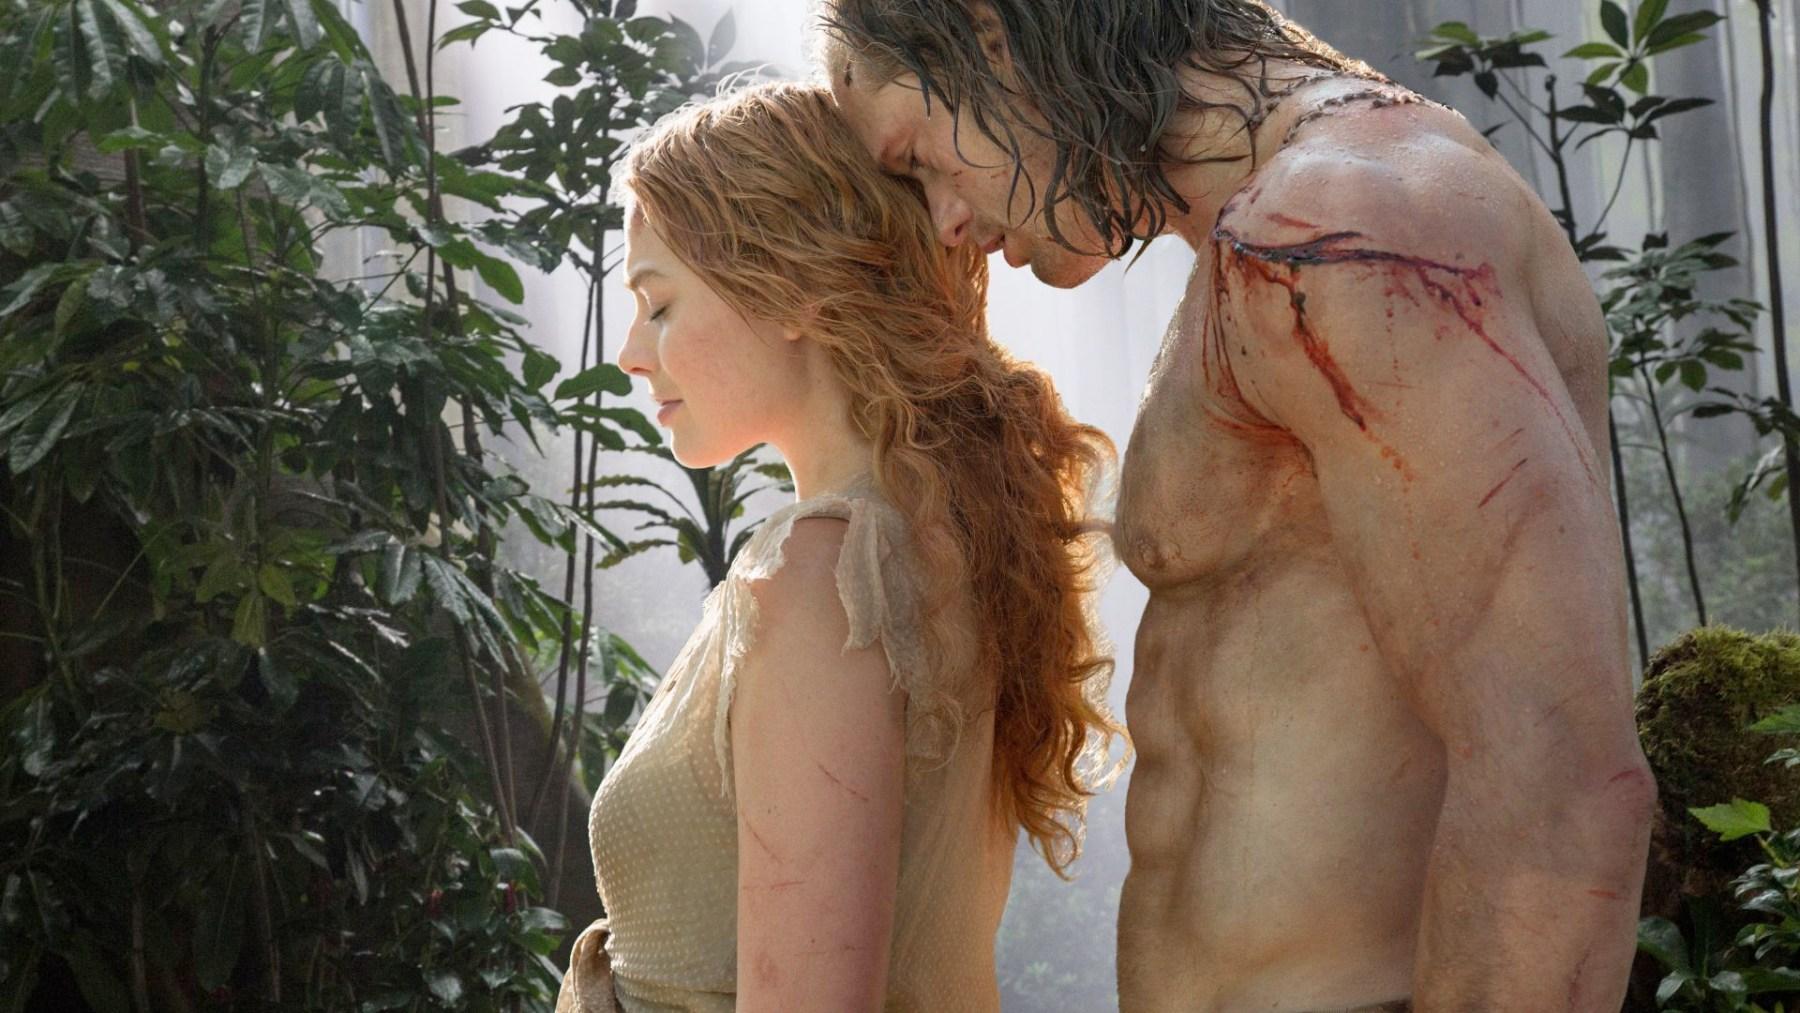 Margot Robbie stars as Jane with Alexander Skarsgard as Tarzan in the latest rendition, called 'The Legend of Tarzan.' (Courtesy Warner Bros.)